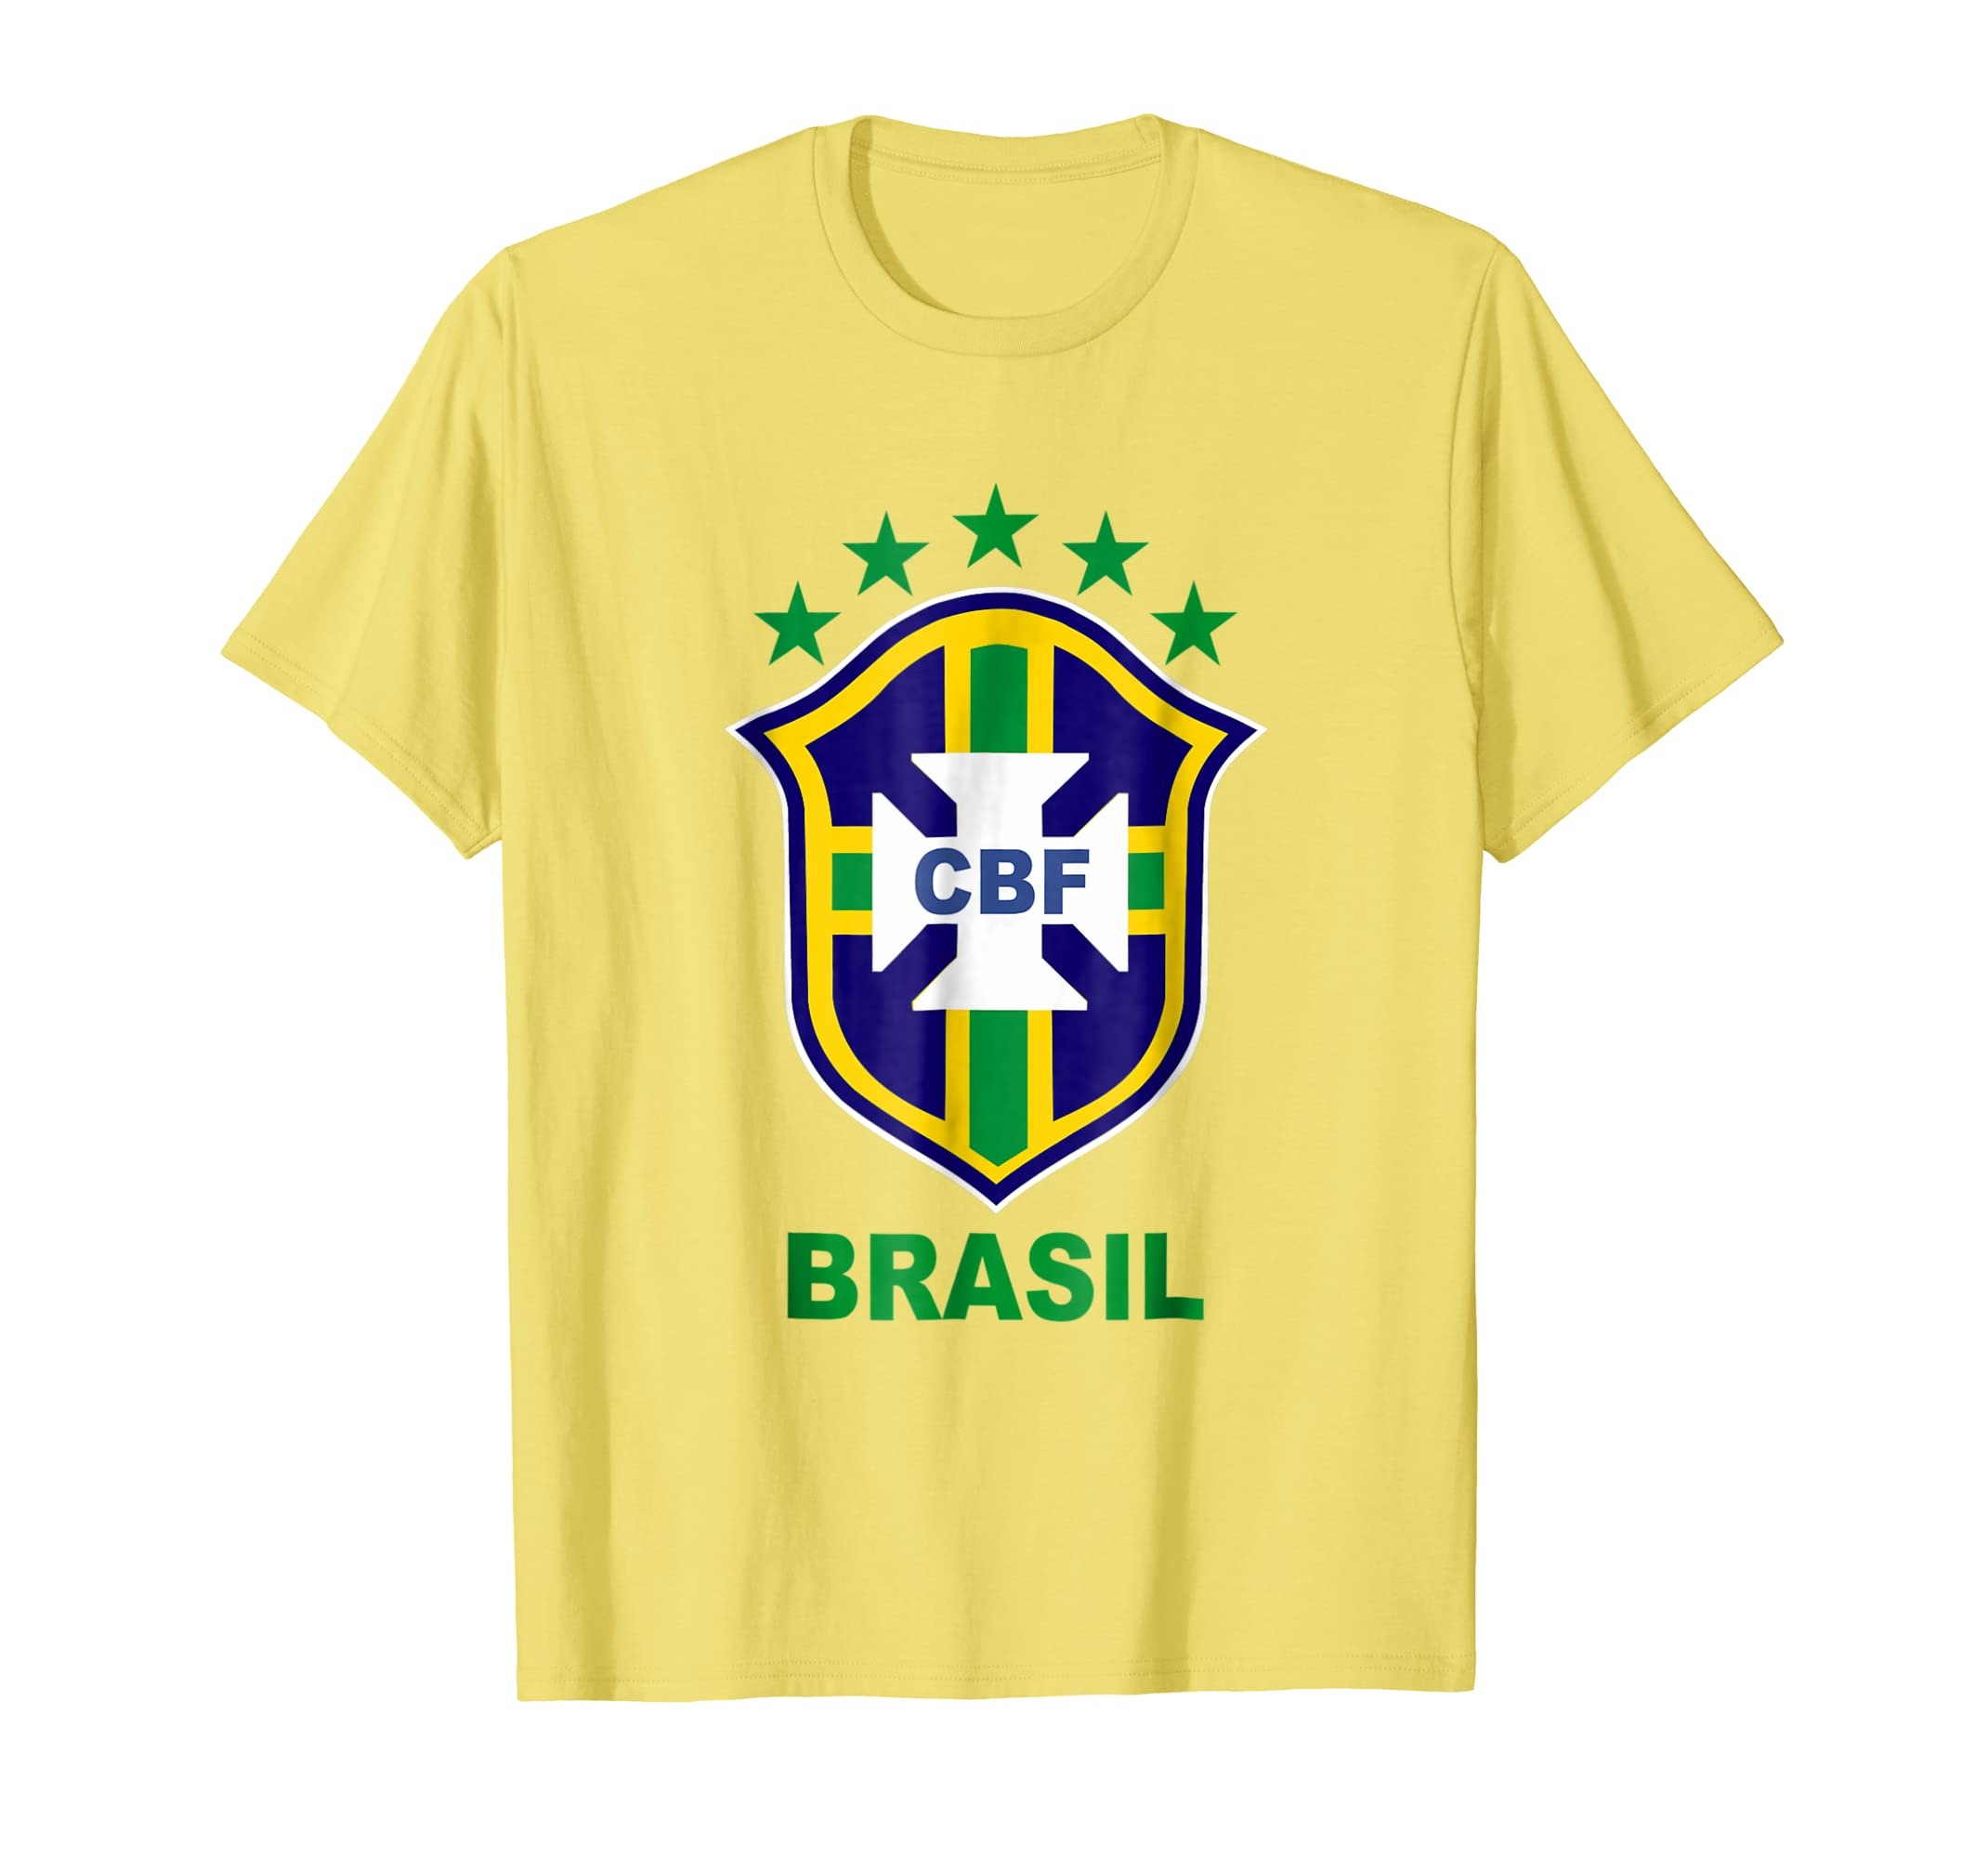 Amazon.com: Brasil, Copa Do Mundo, Russia 2018 tshirt - Camiseta Futebol: Clothing